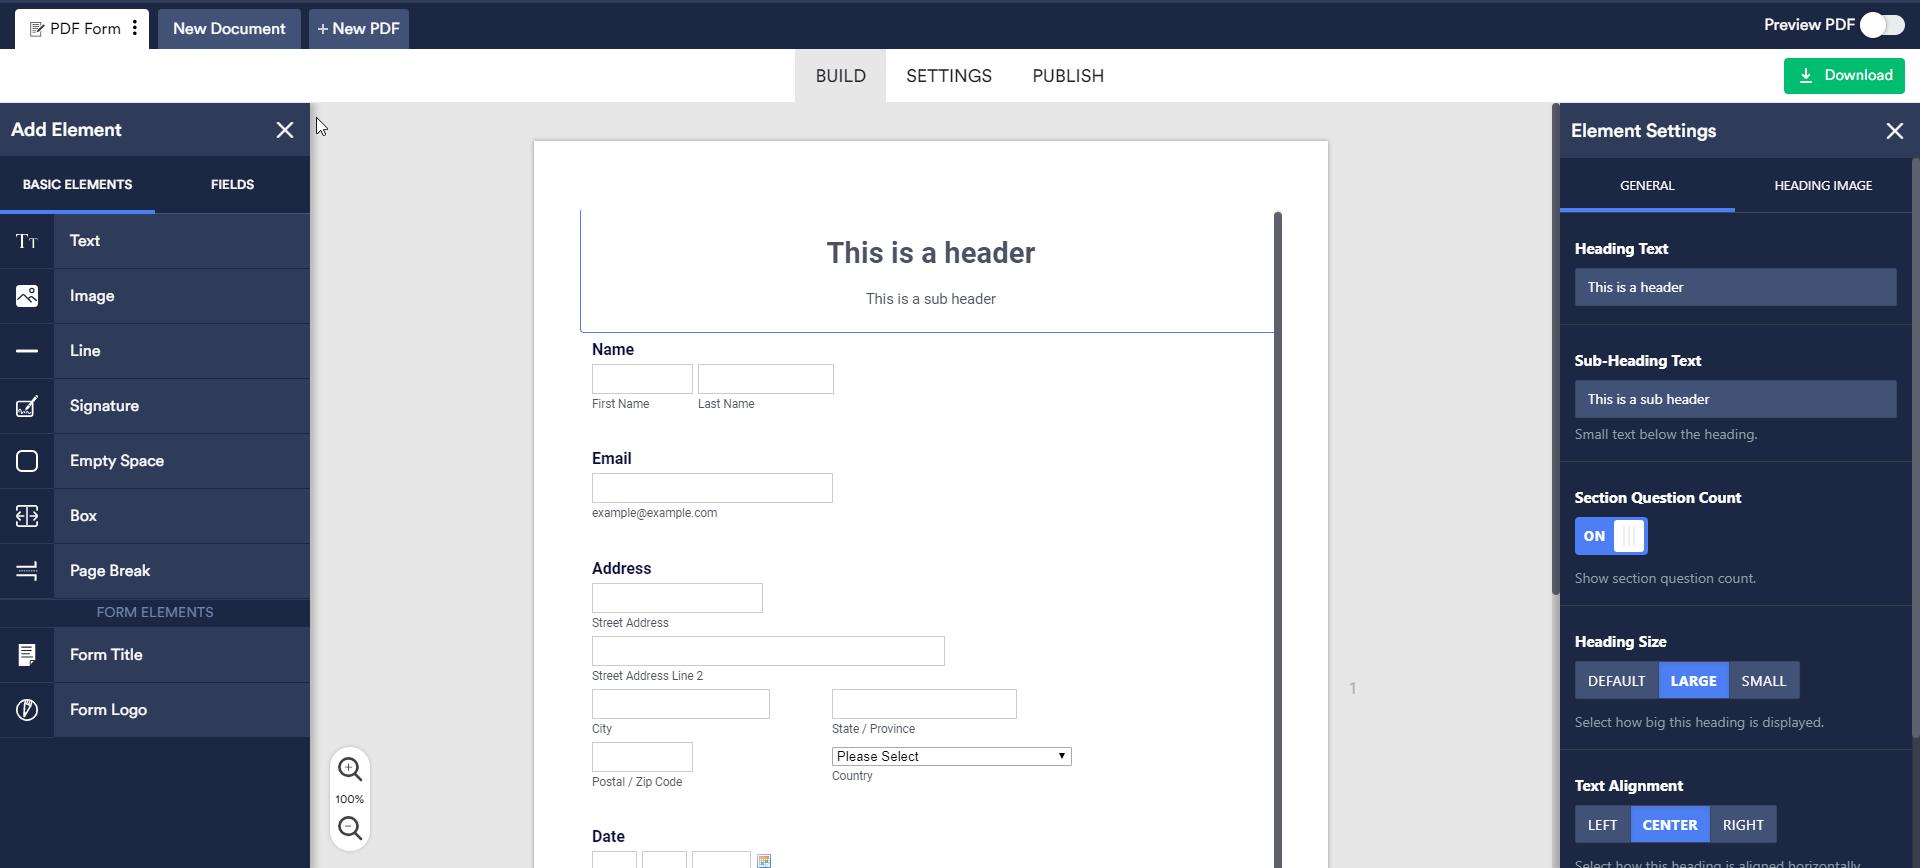 How to Create a PDF Form